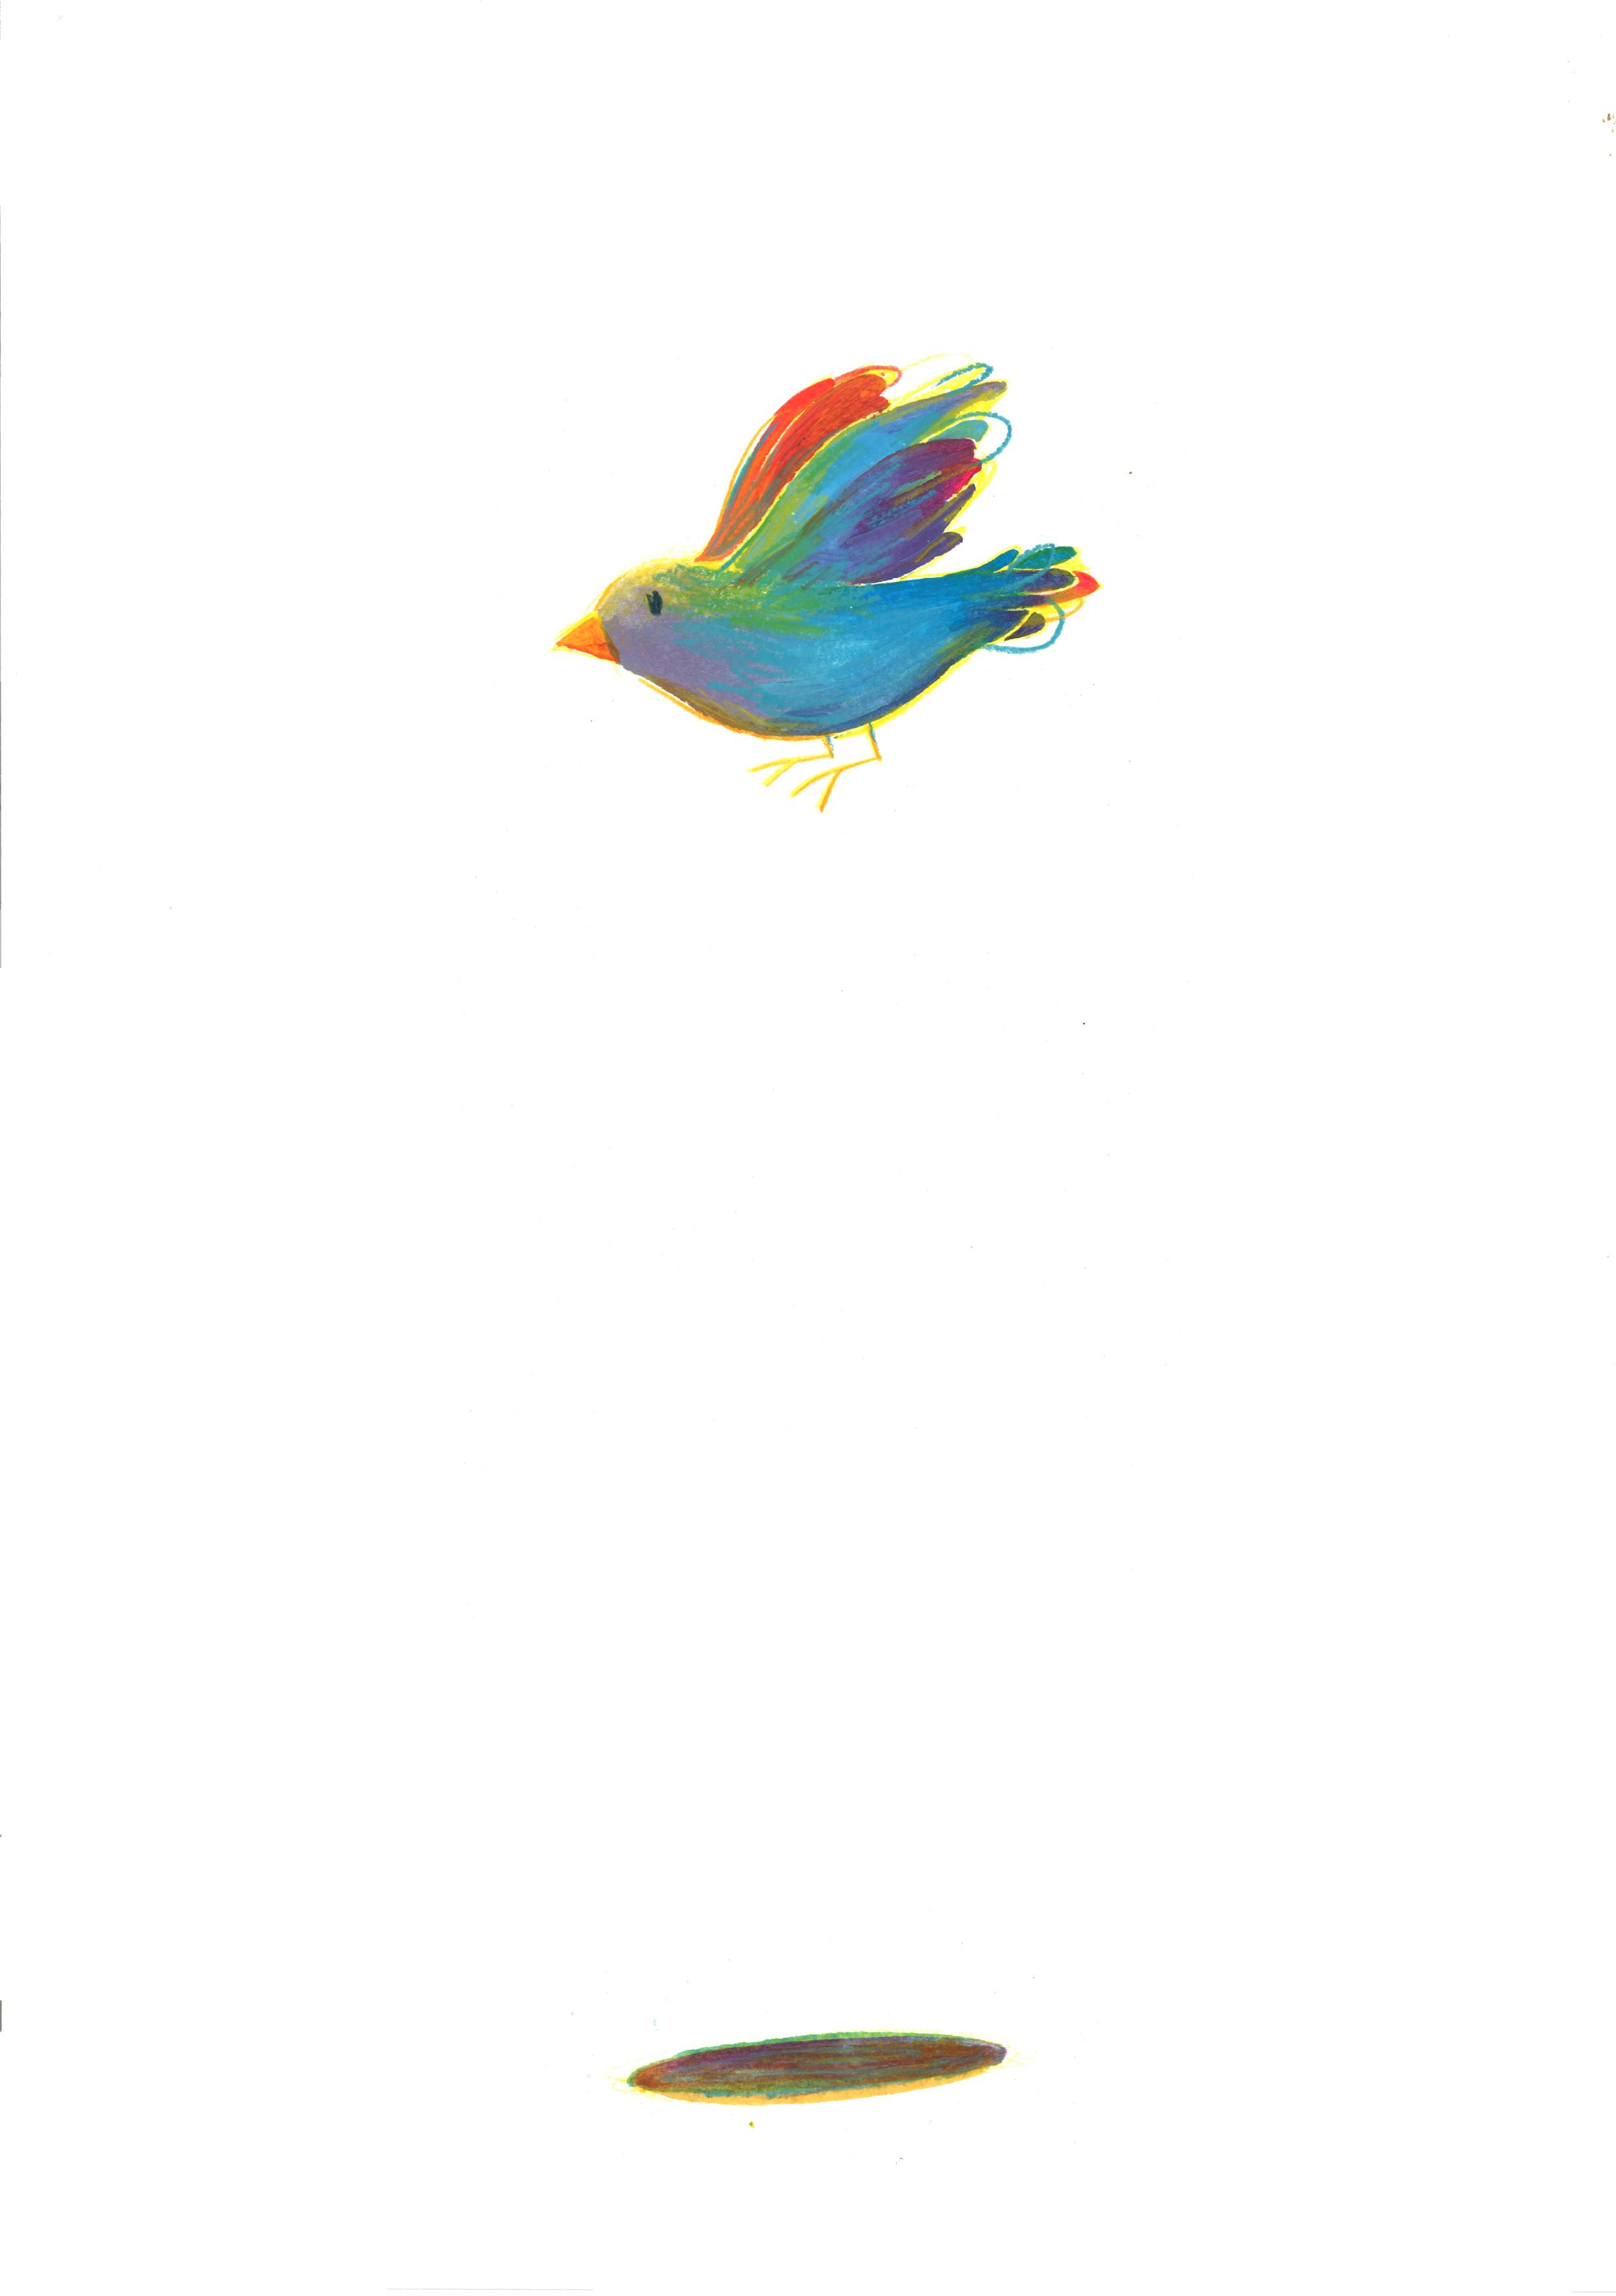 Me_fui_a_volar_Edurne_Cacho_pagina00010